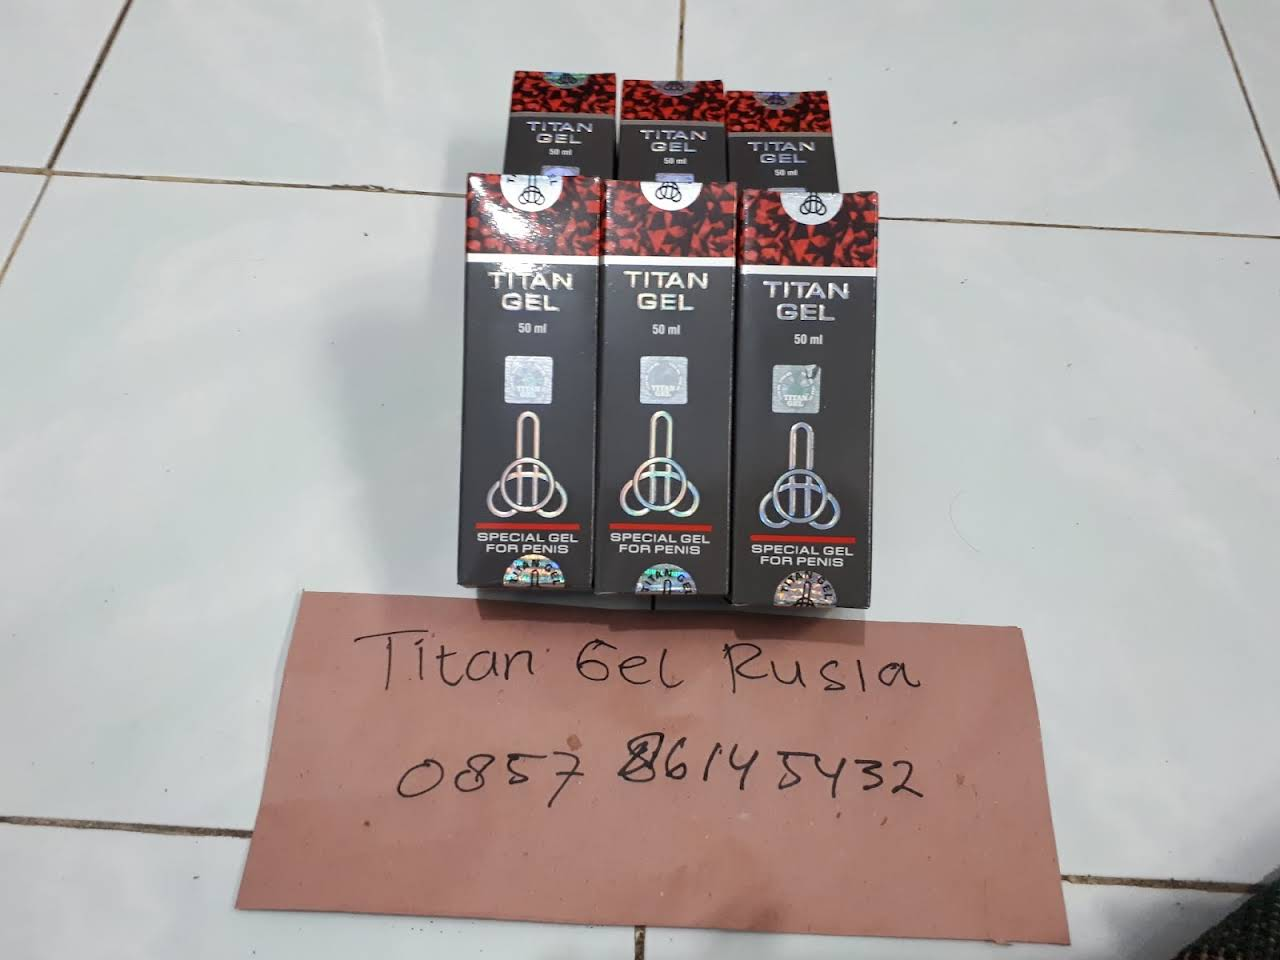 titan gel asli obat vimax asli hammer of thor obat penirum obat